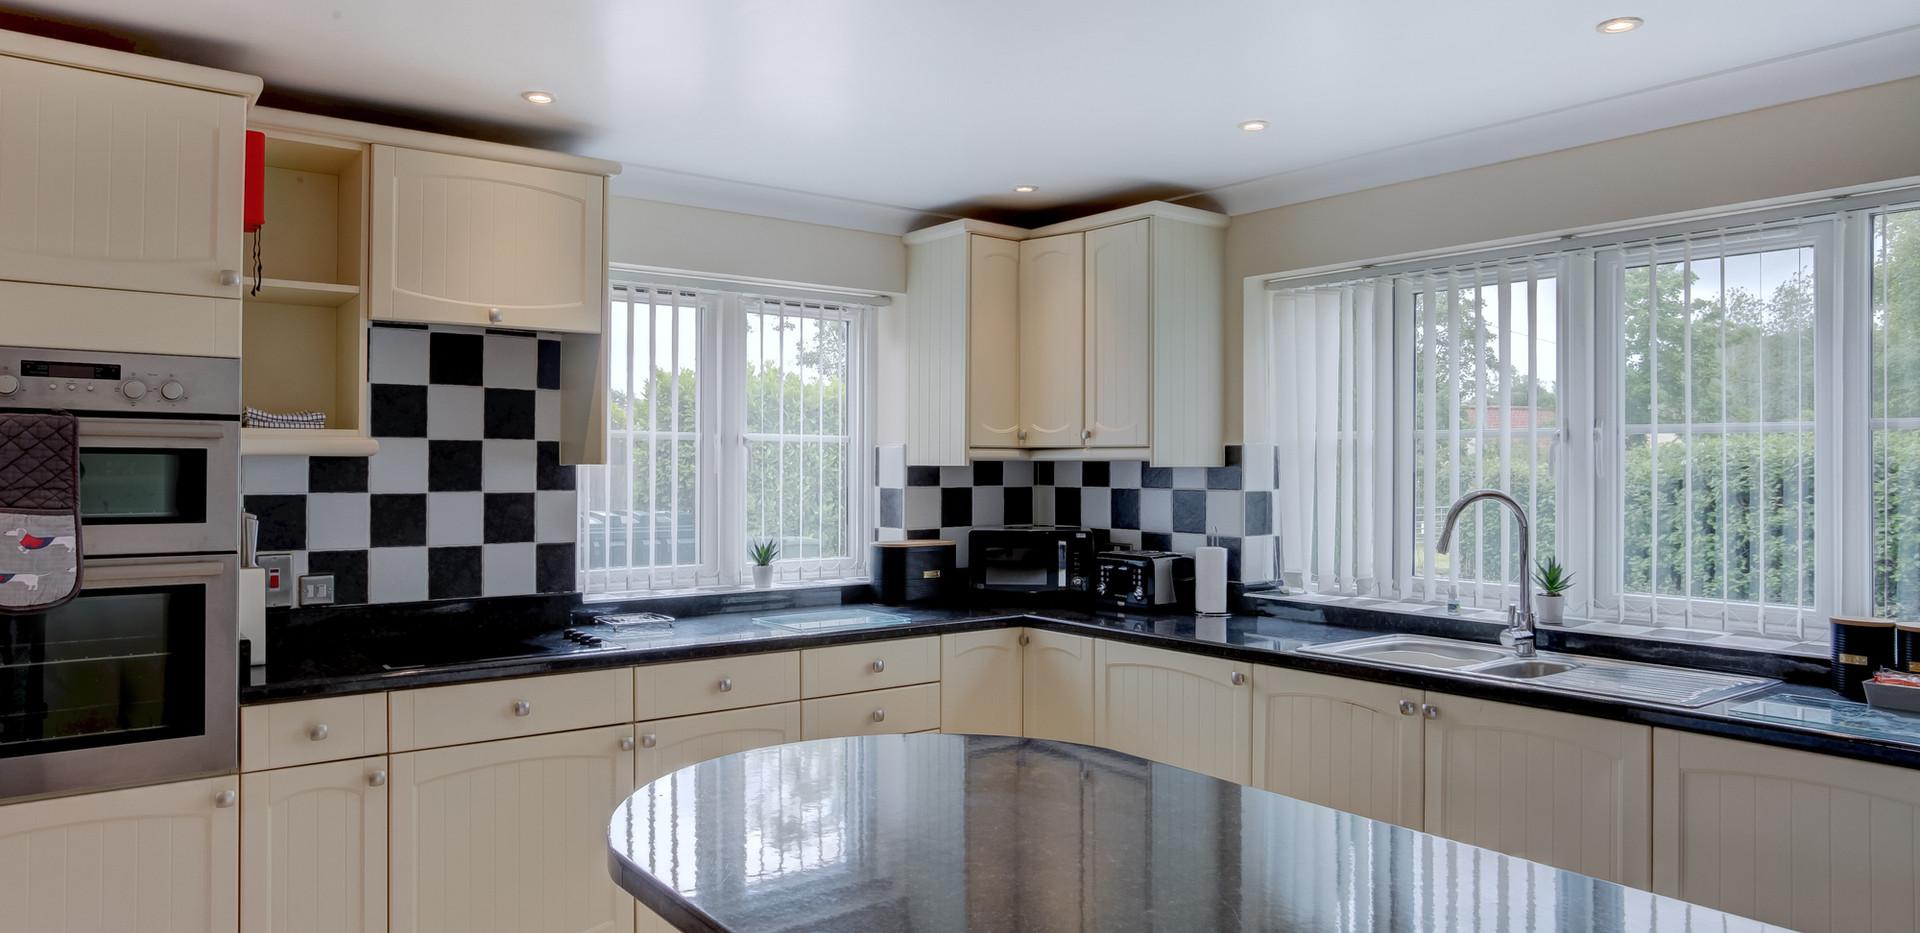 teasel-kitchen-2.jpg